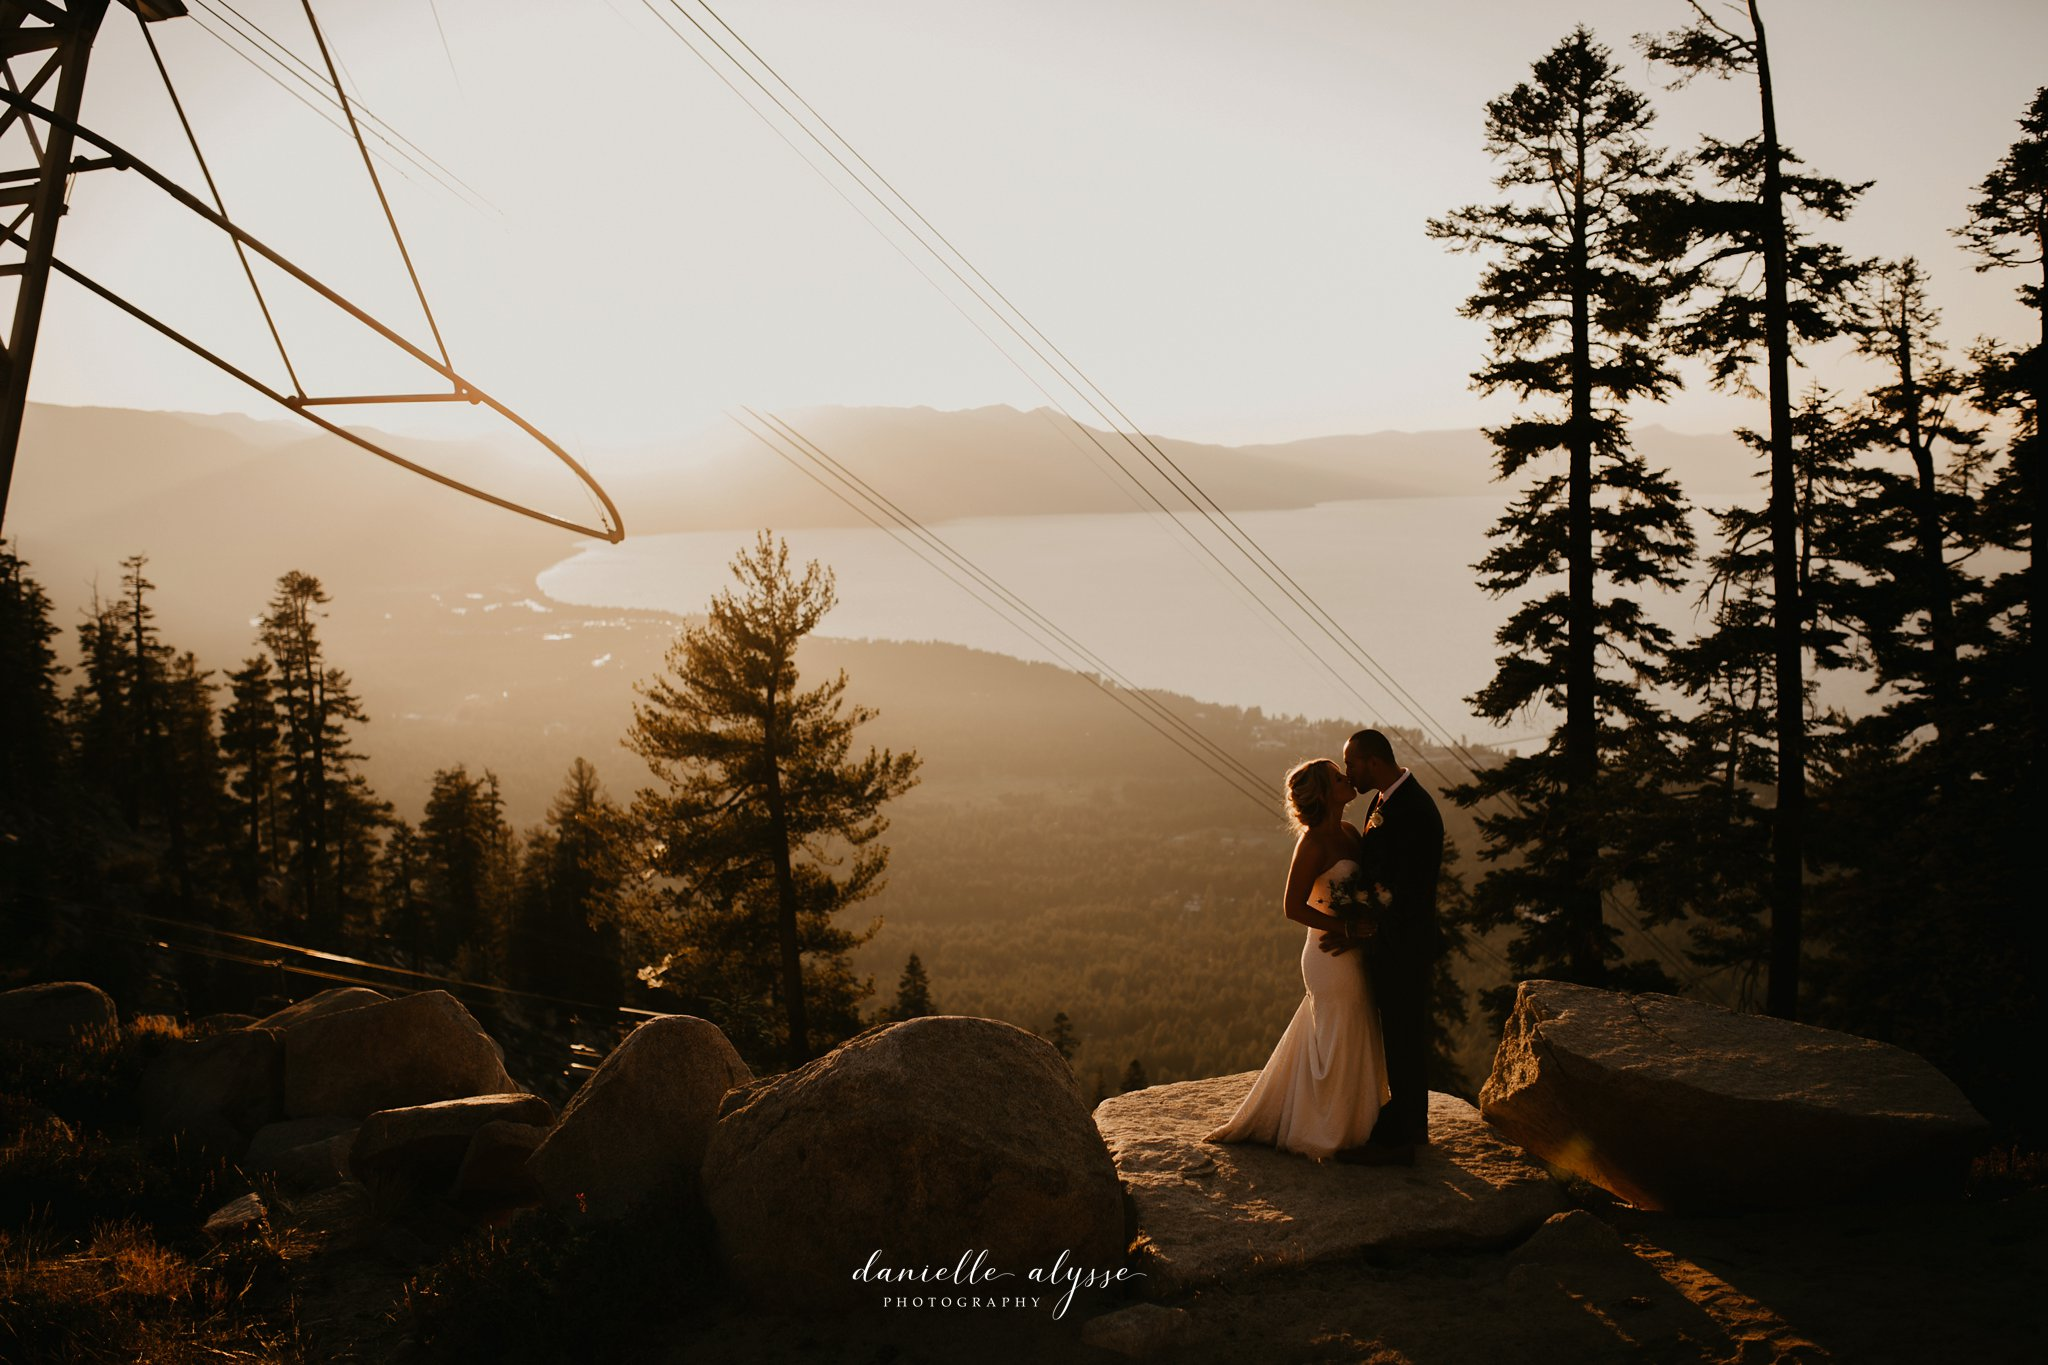 180831_wedding_stephanie_heavenly_south_lake_tahoe_danielle_alysse_photography_destination_blog_991_WEB.jpg